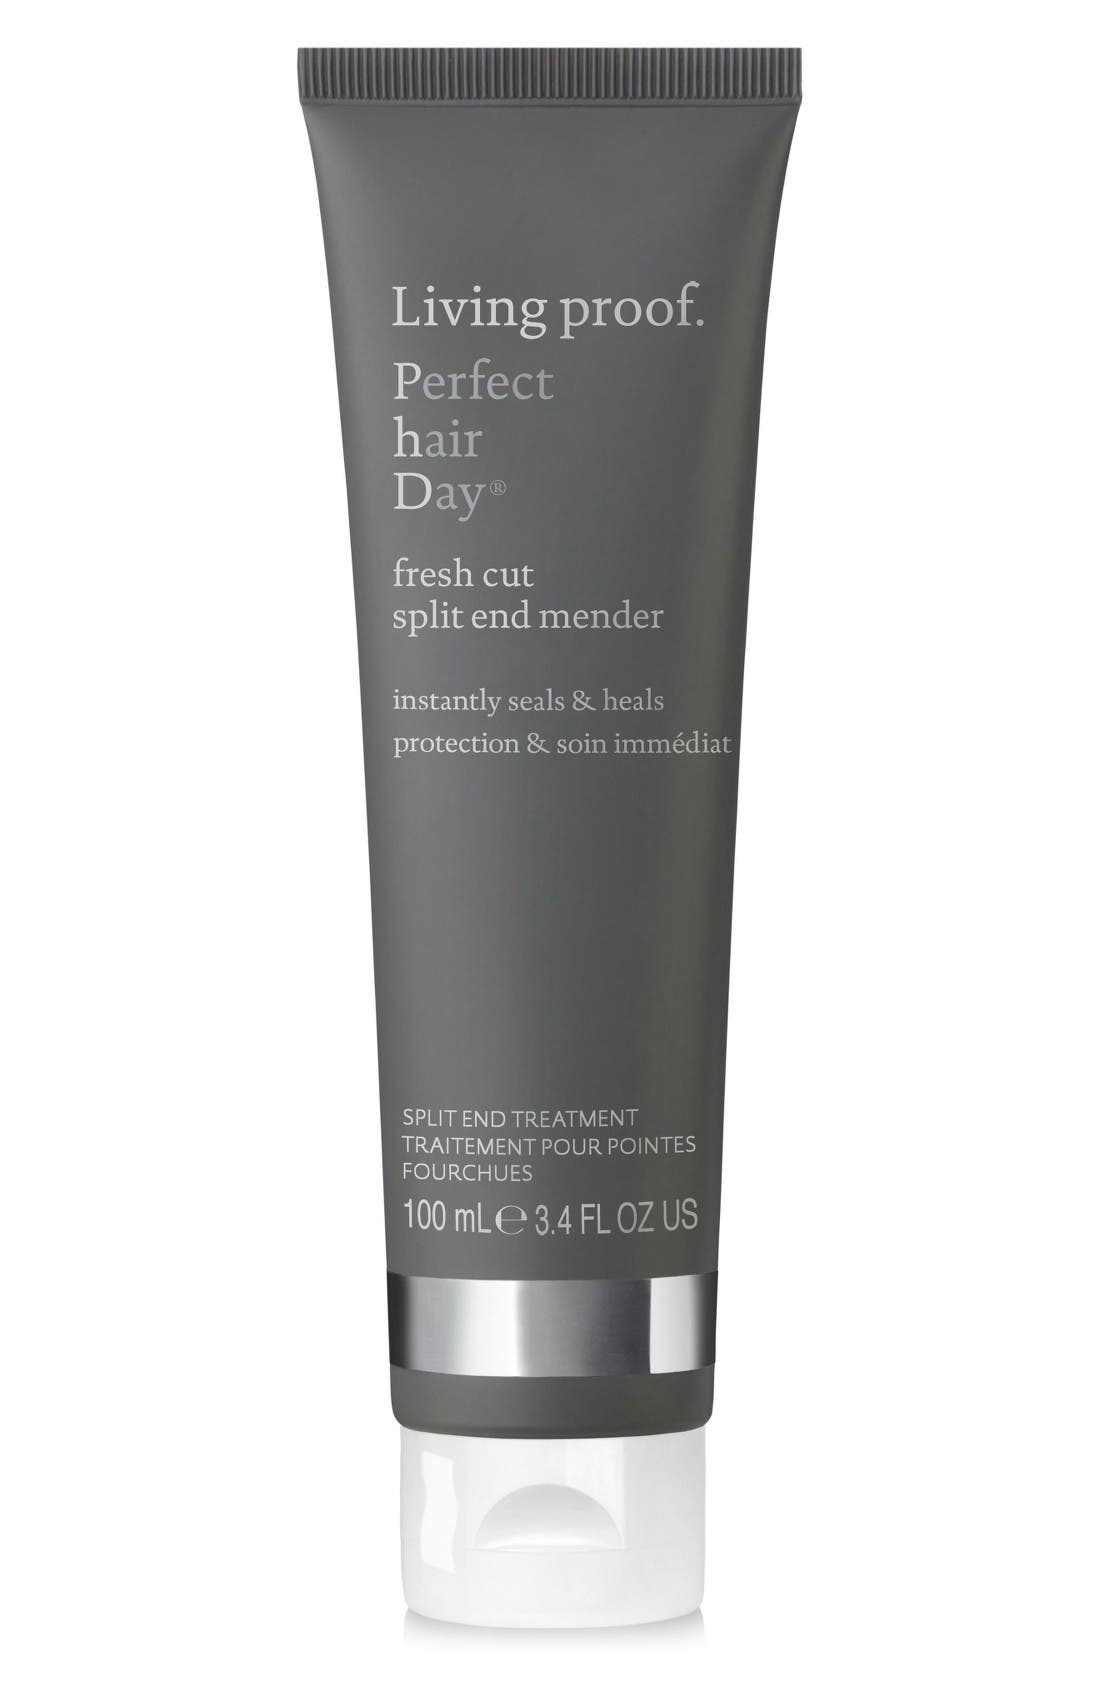 Living proof® Perfect hair Day Fresh Cut Split End Mender